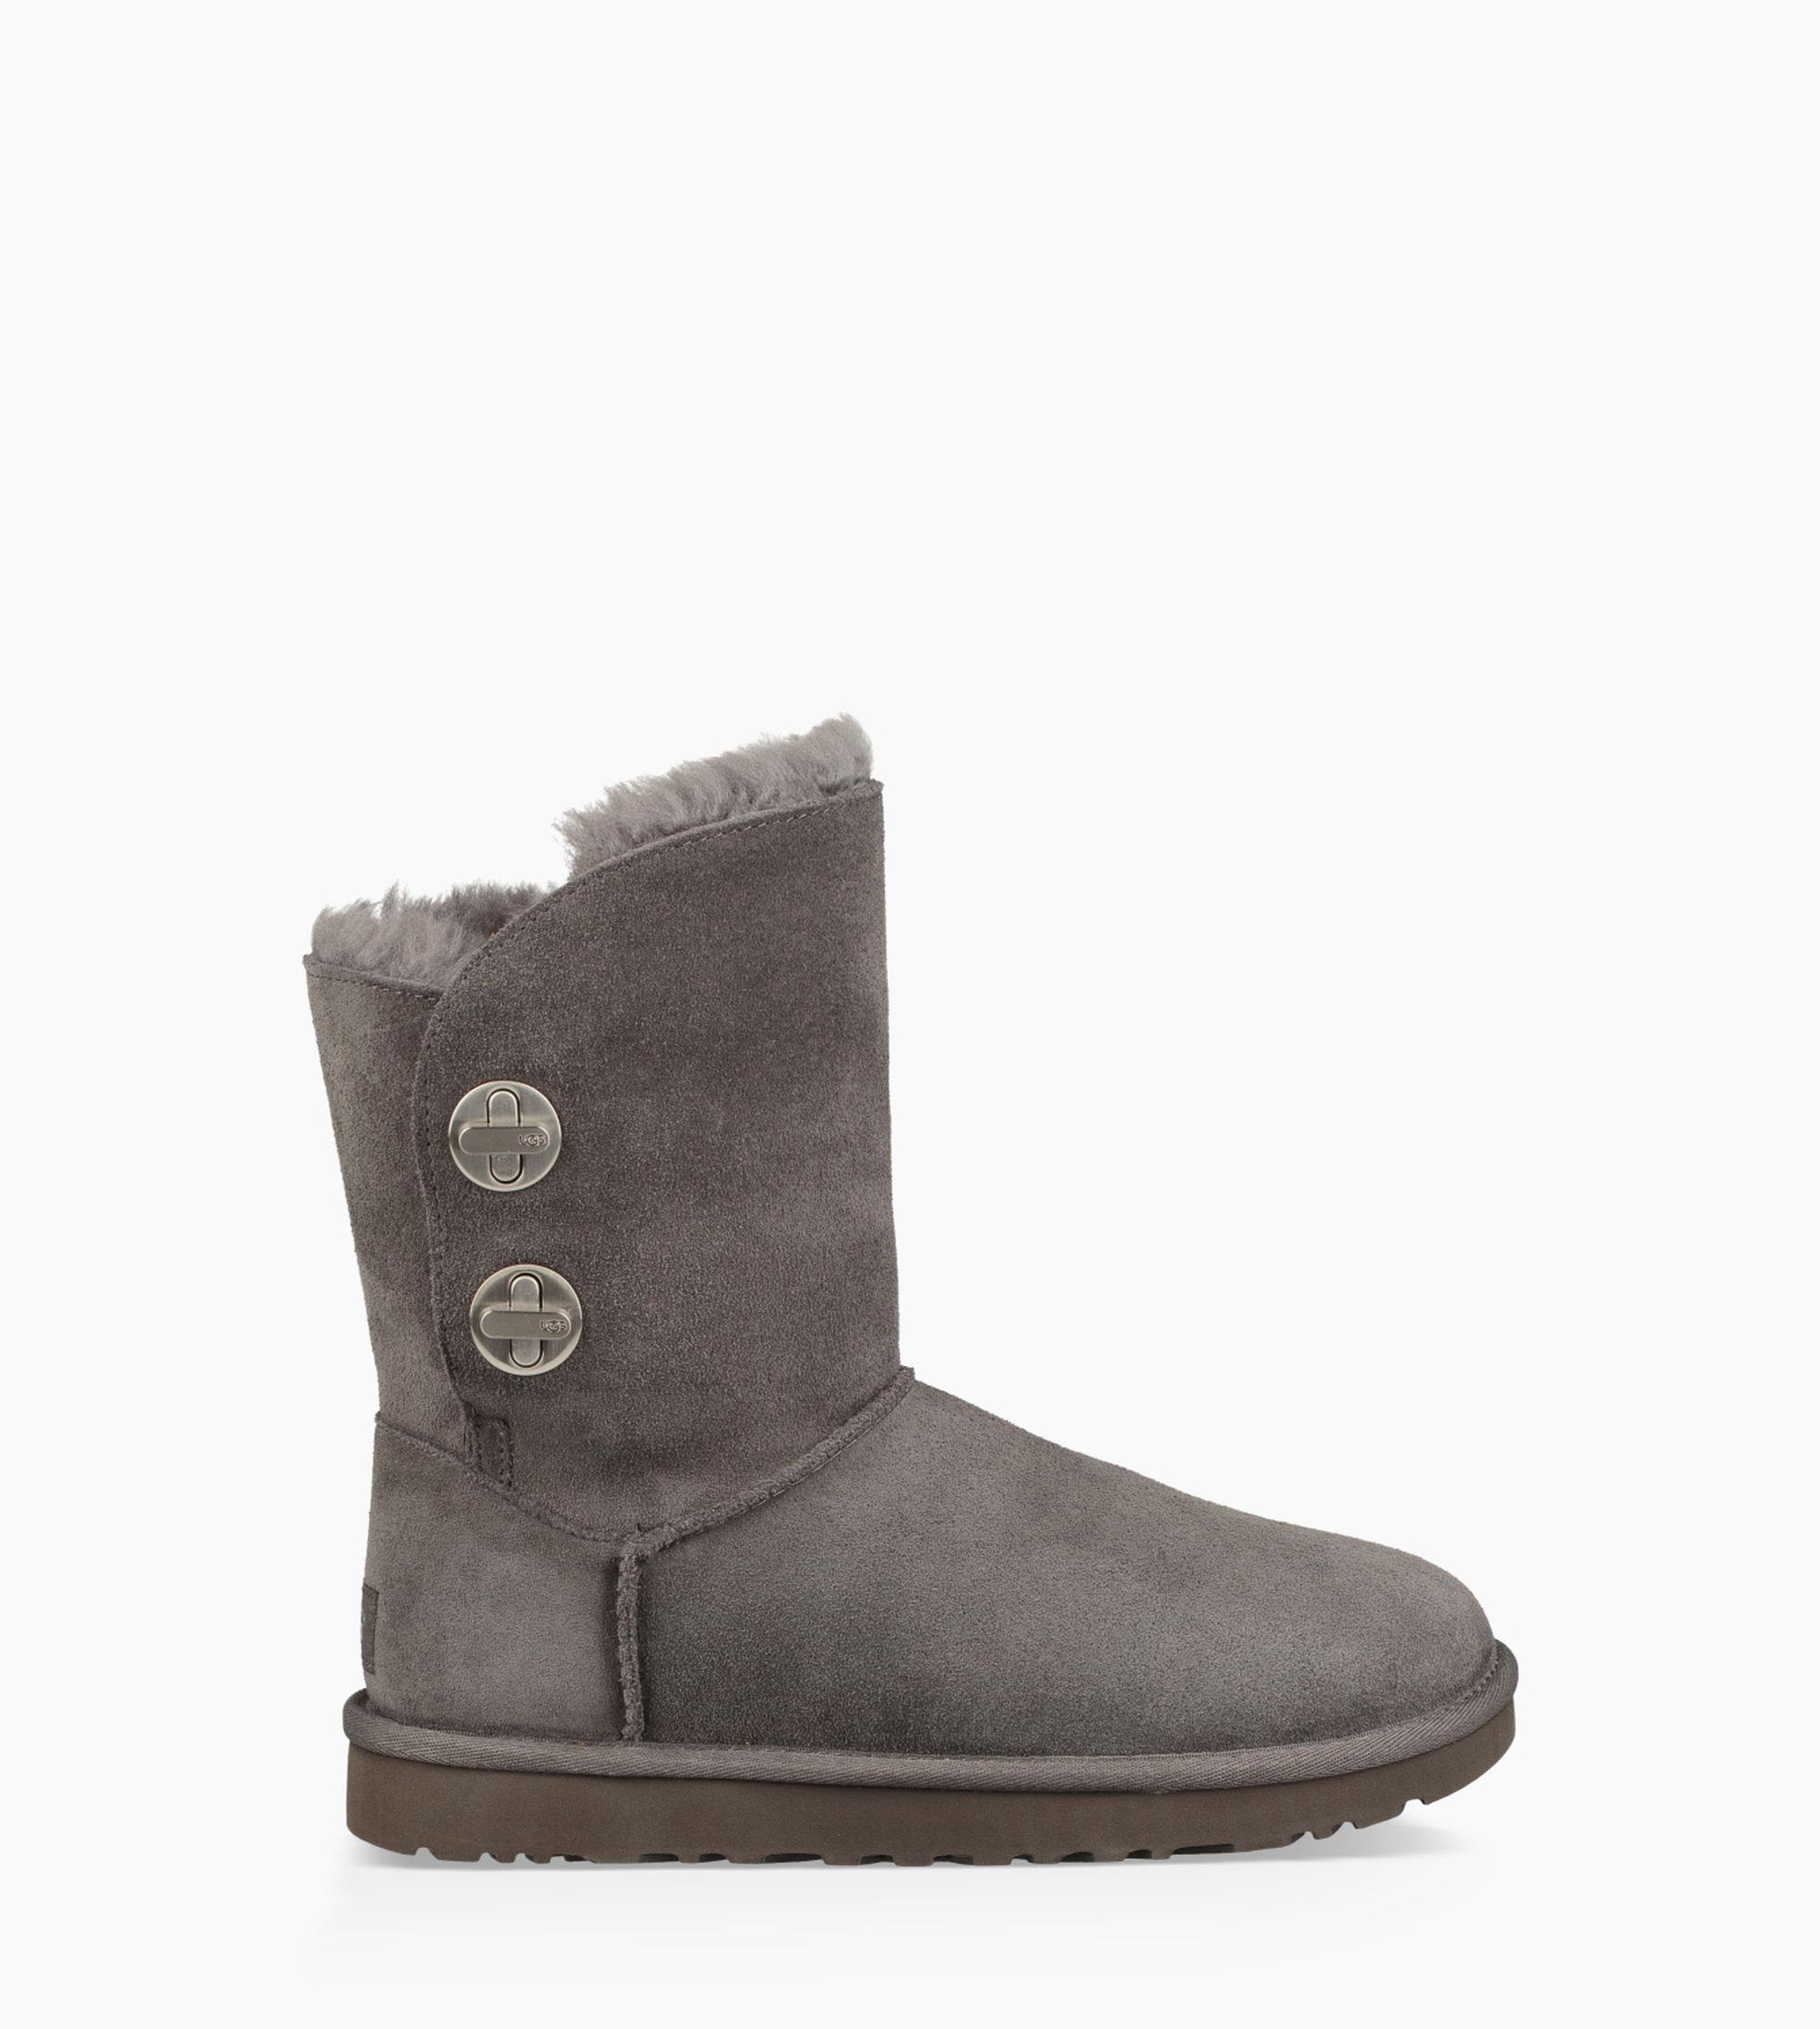 46781dcf3f4 Ugg Gray Classic Short Turnlock Boot Classic Short Turnlock Boot